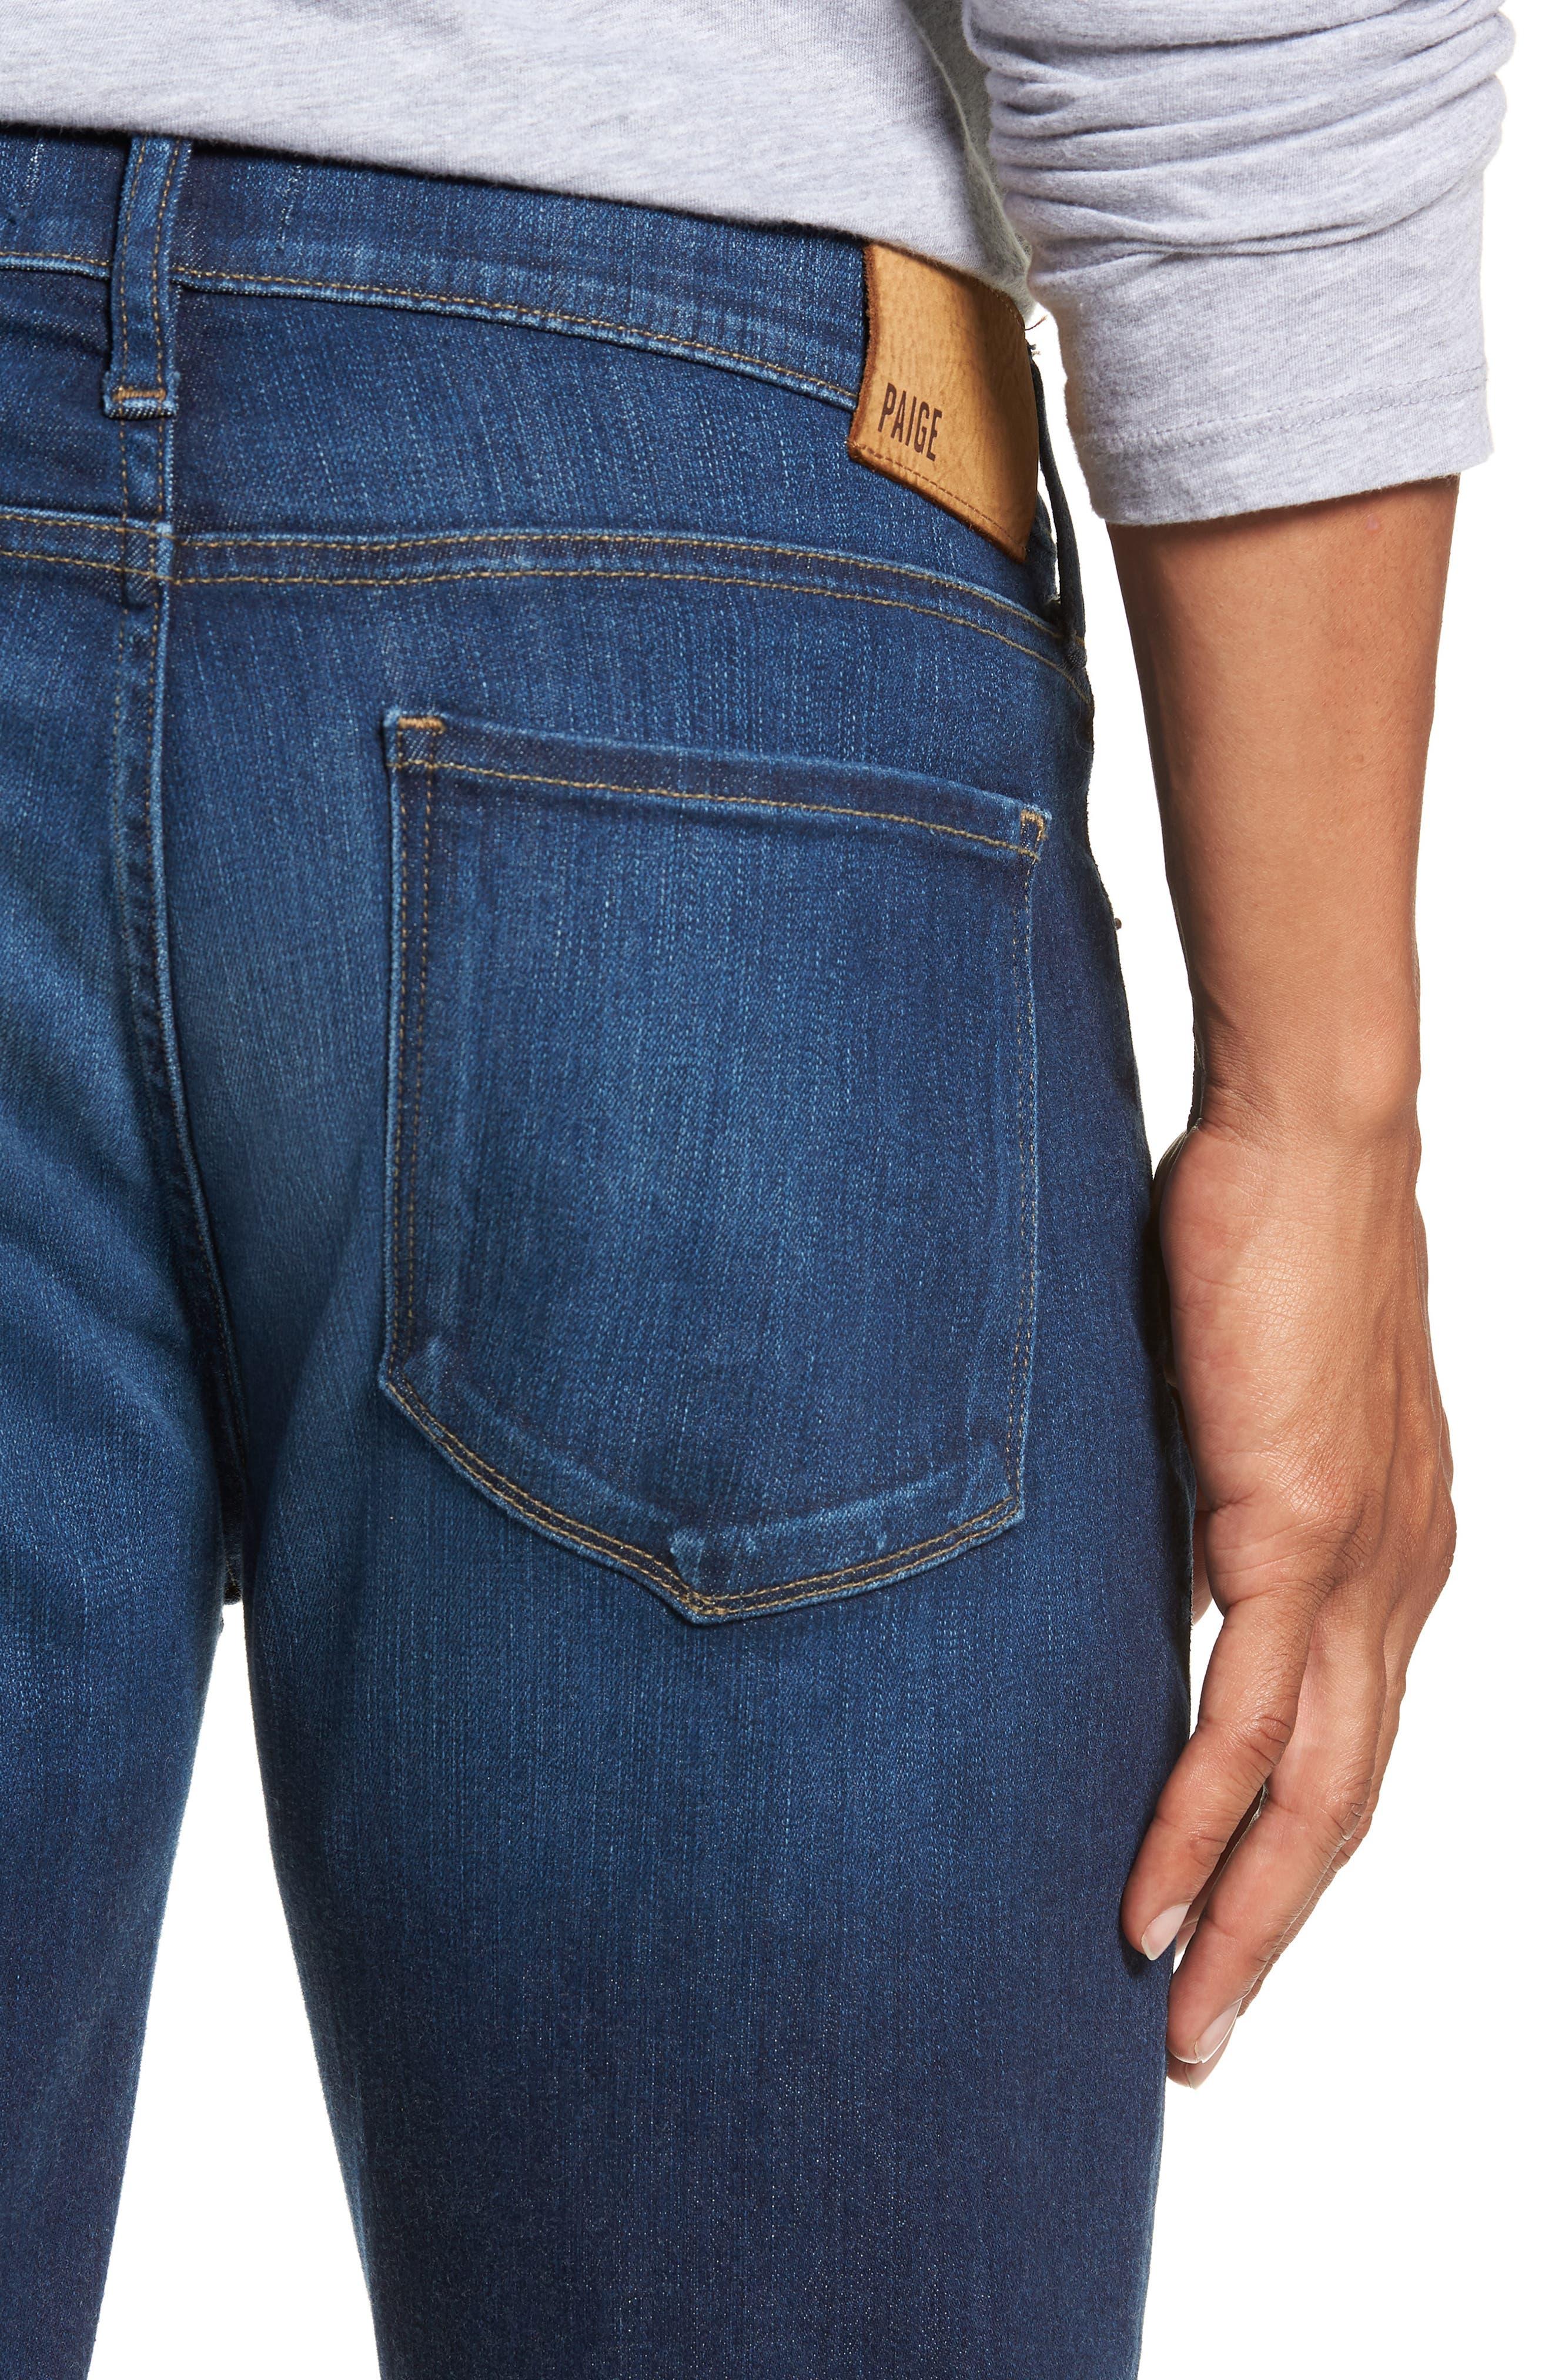 Transcend Vintage - Federal Slim Straight Leg Jeans,                             Alternate thumbnail 4, color,                             ELWYN